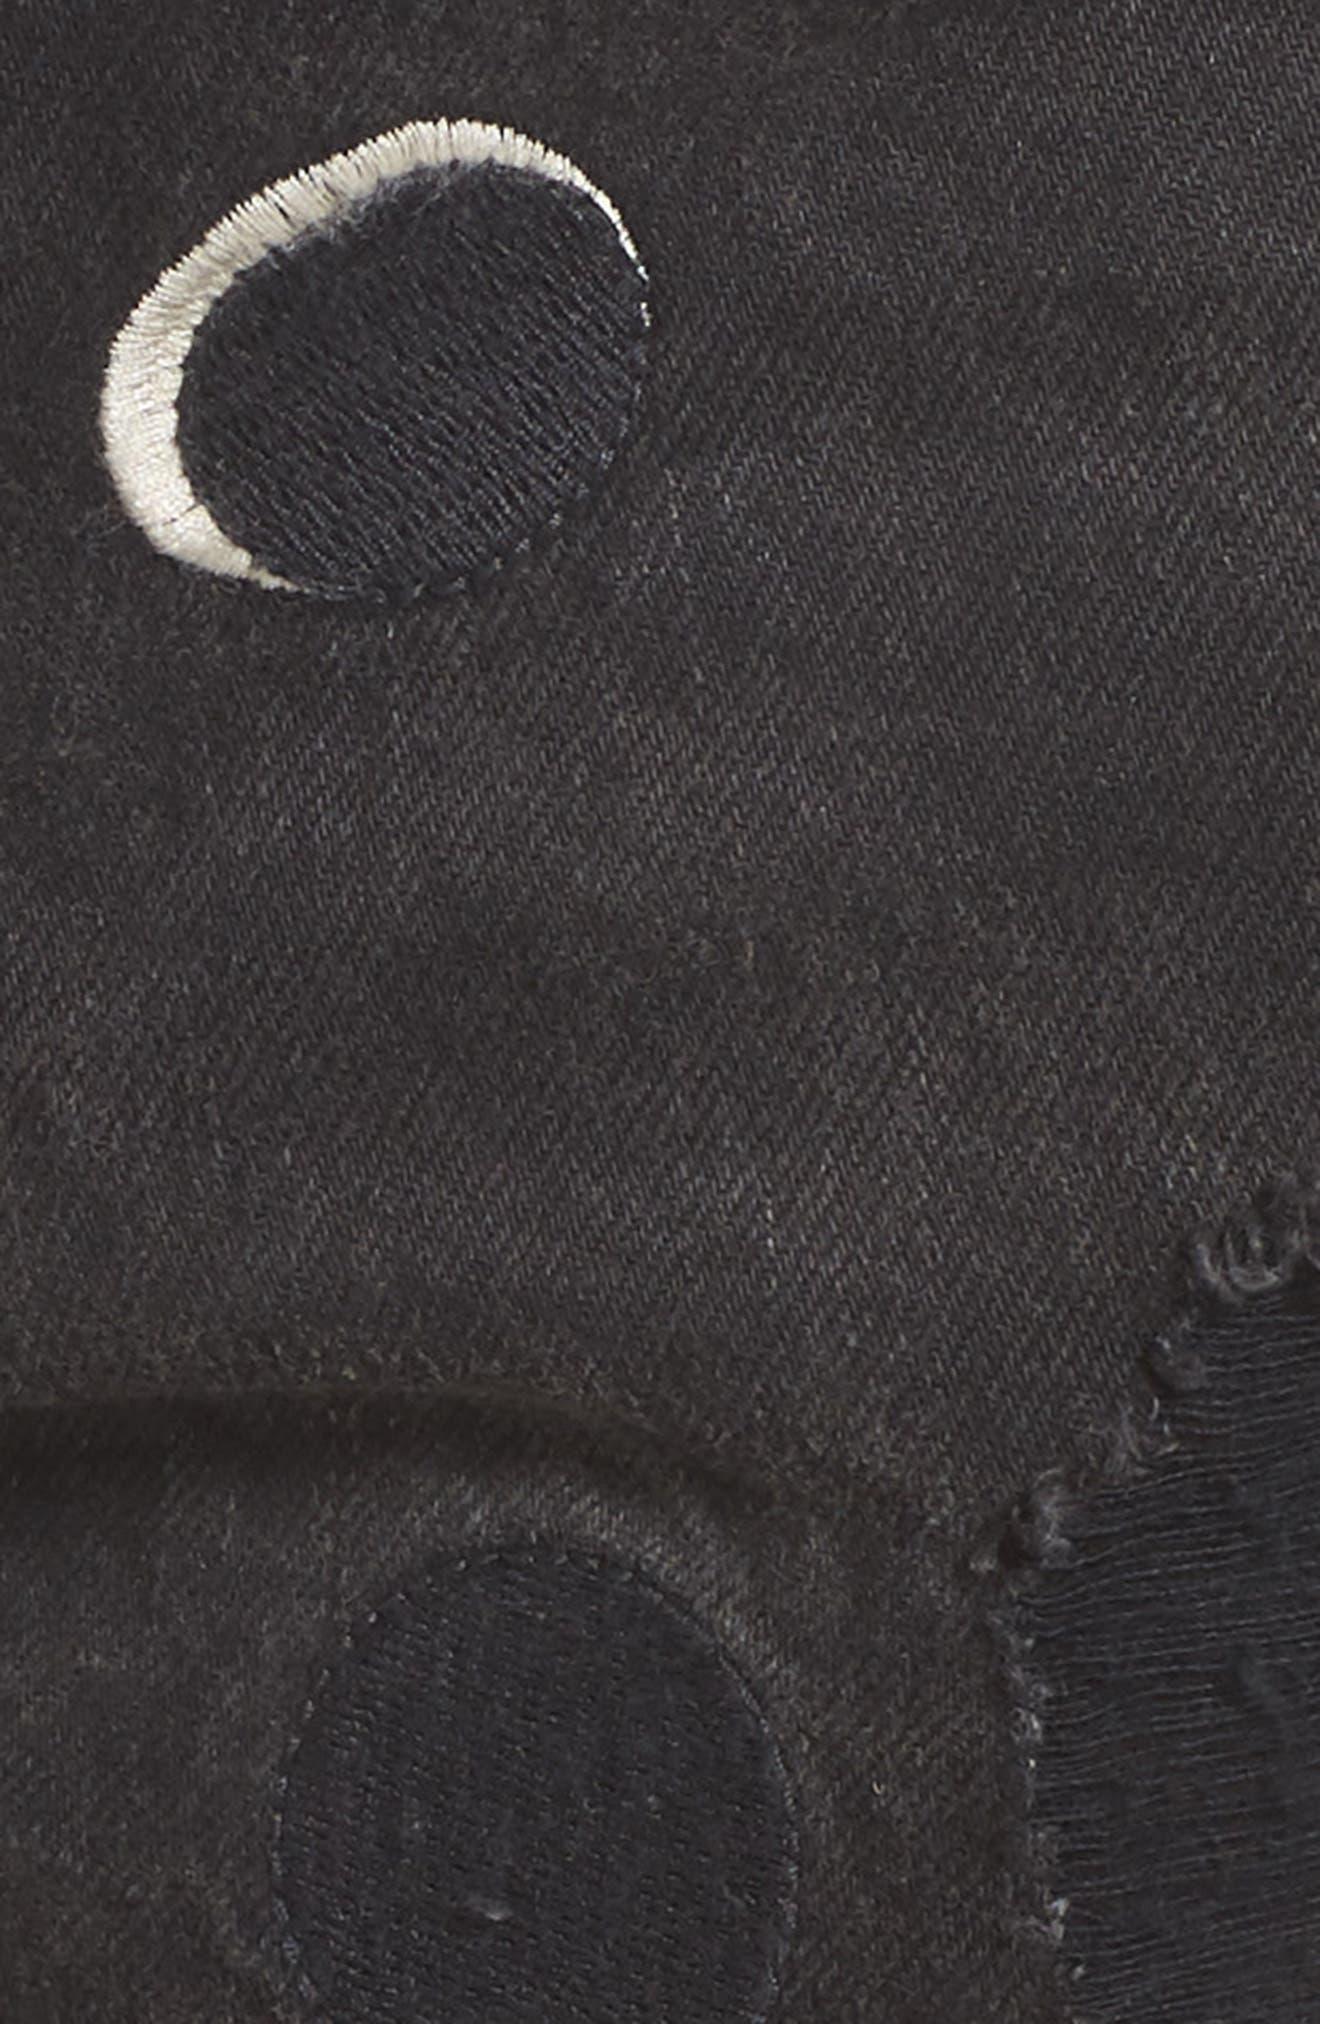 Seasonal Festival Embroidered Denim Shorts,                             Alternate thumbnail 5, color,                             2241 Long Night Moon